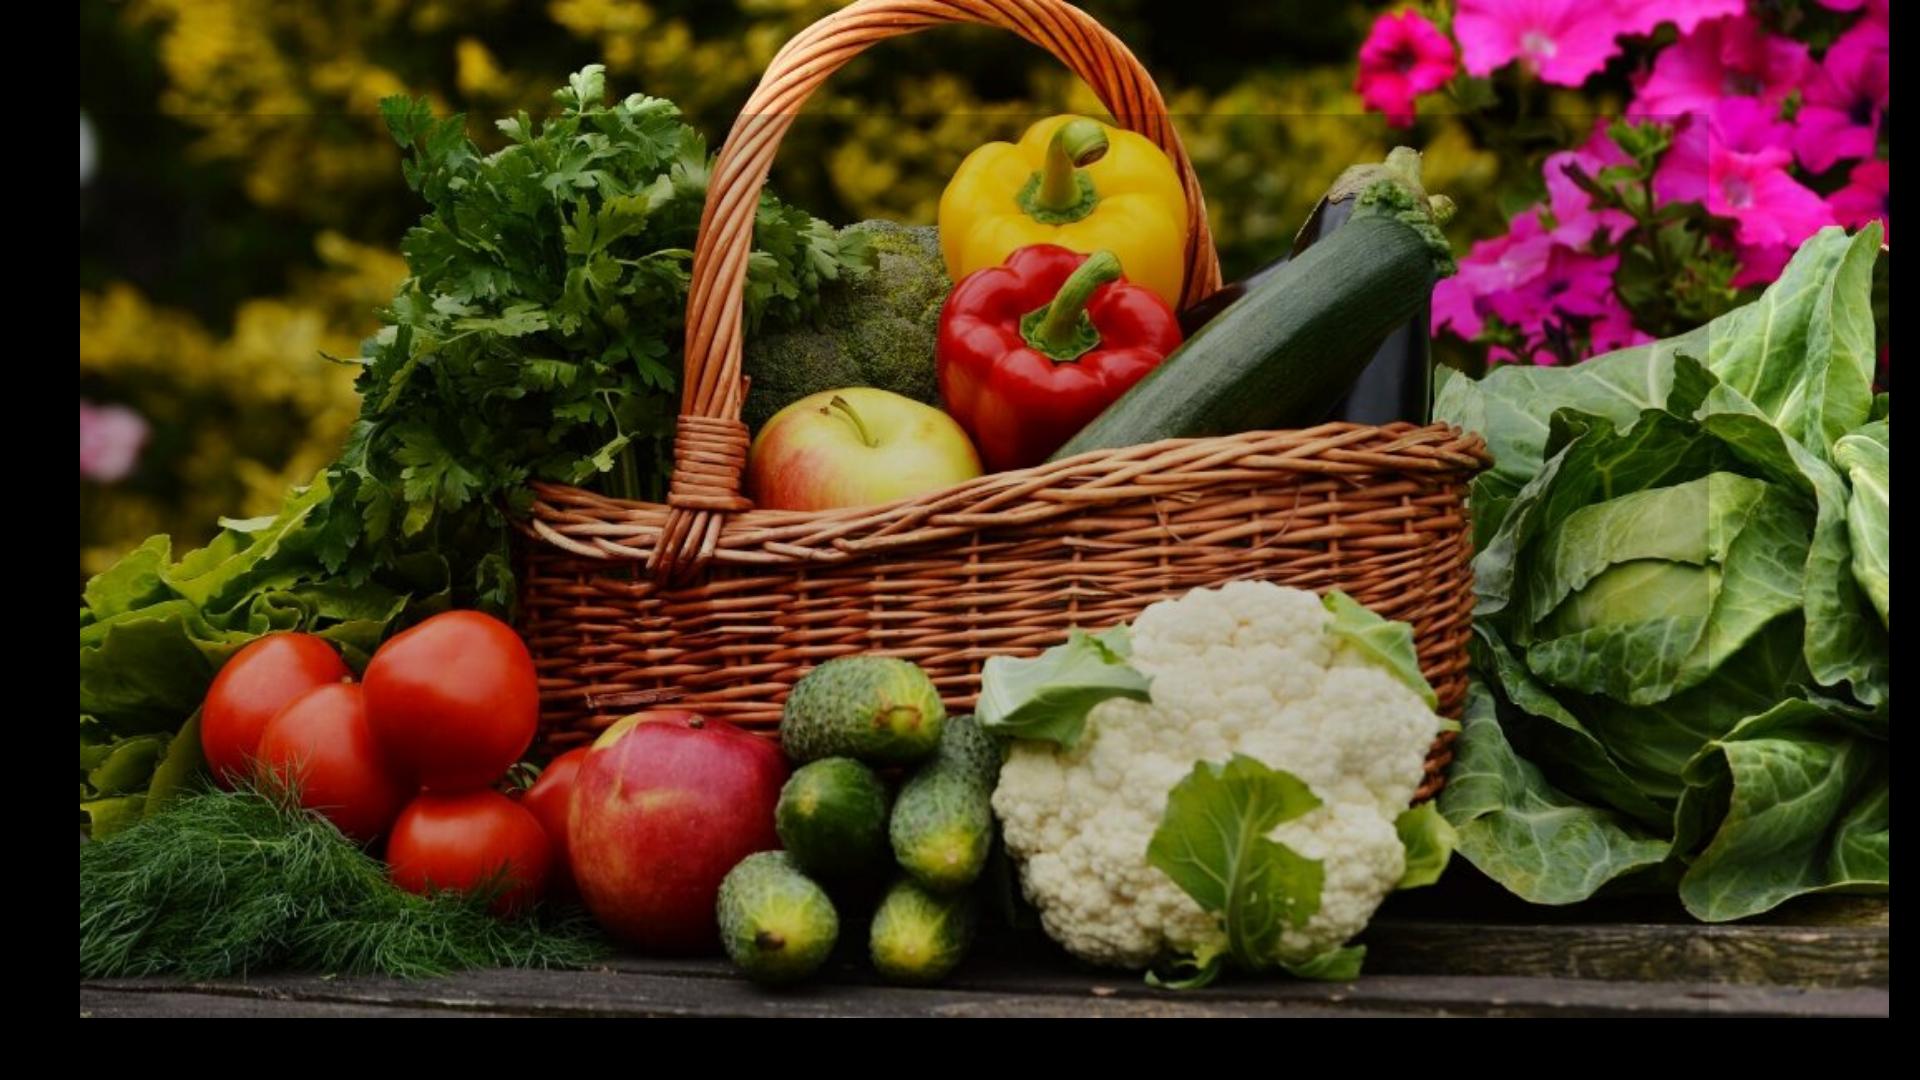 Basket of fresh garden vegetables